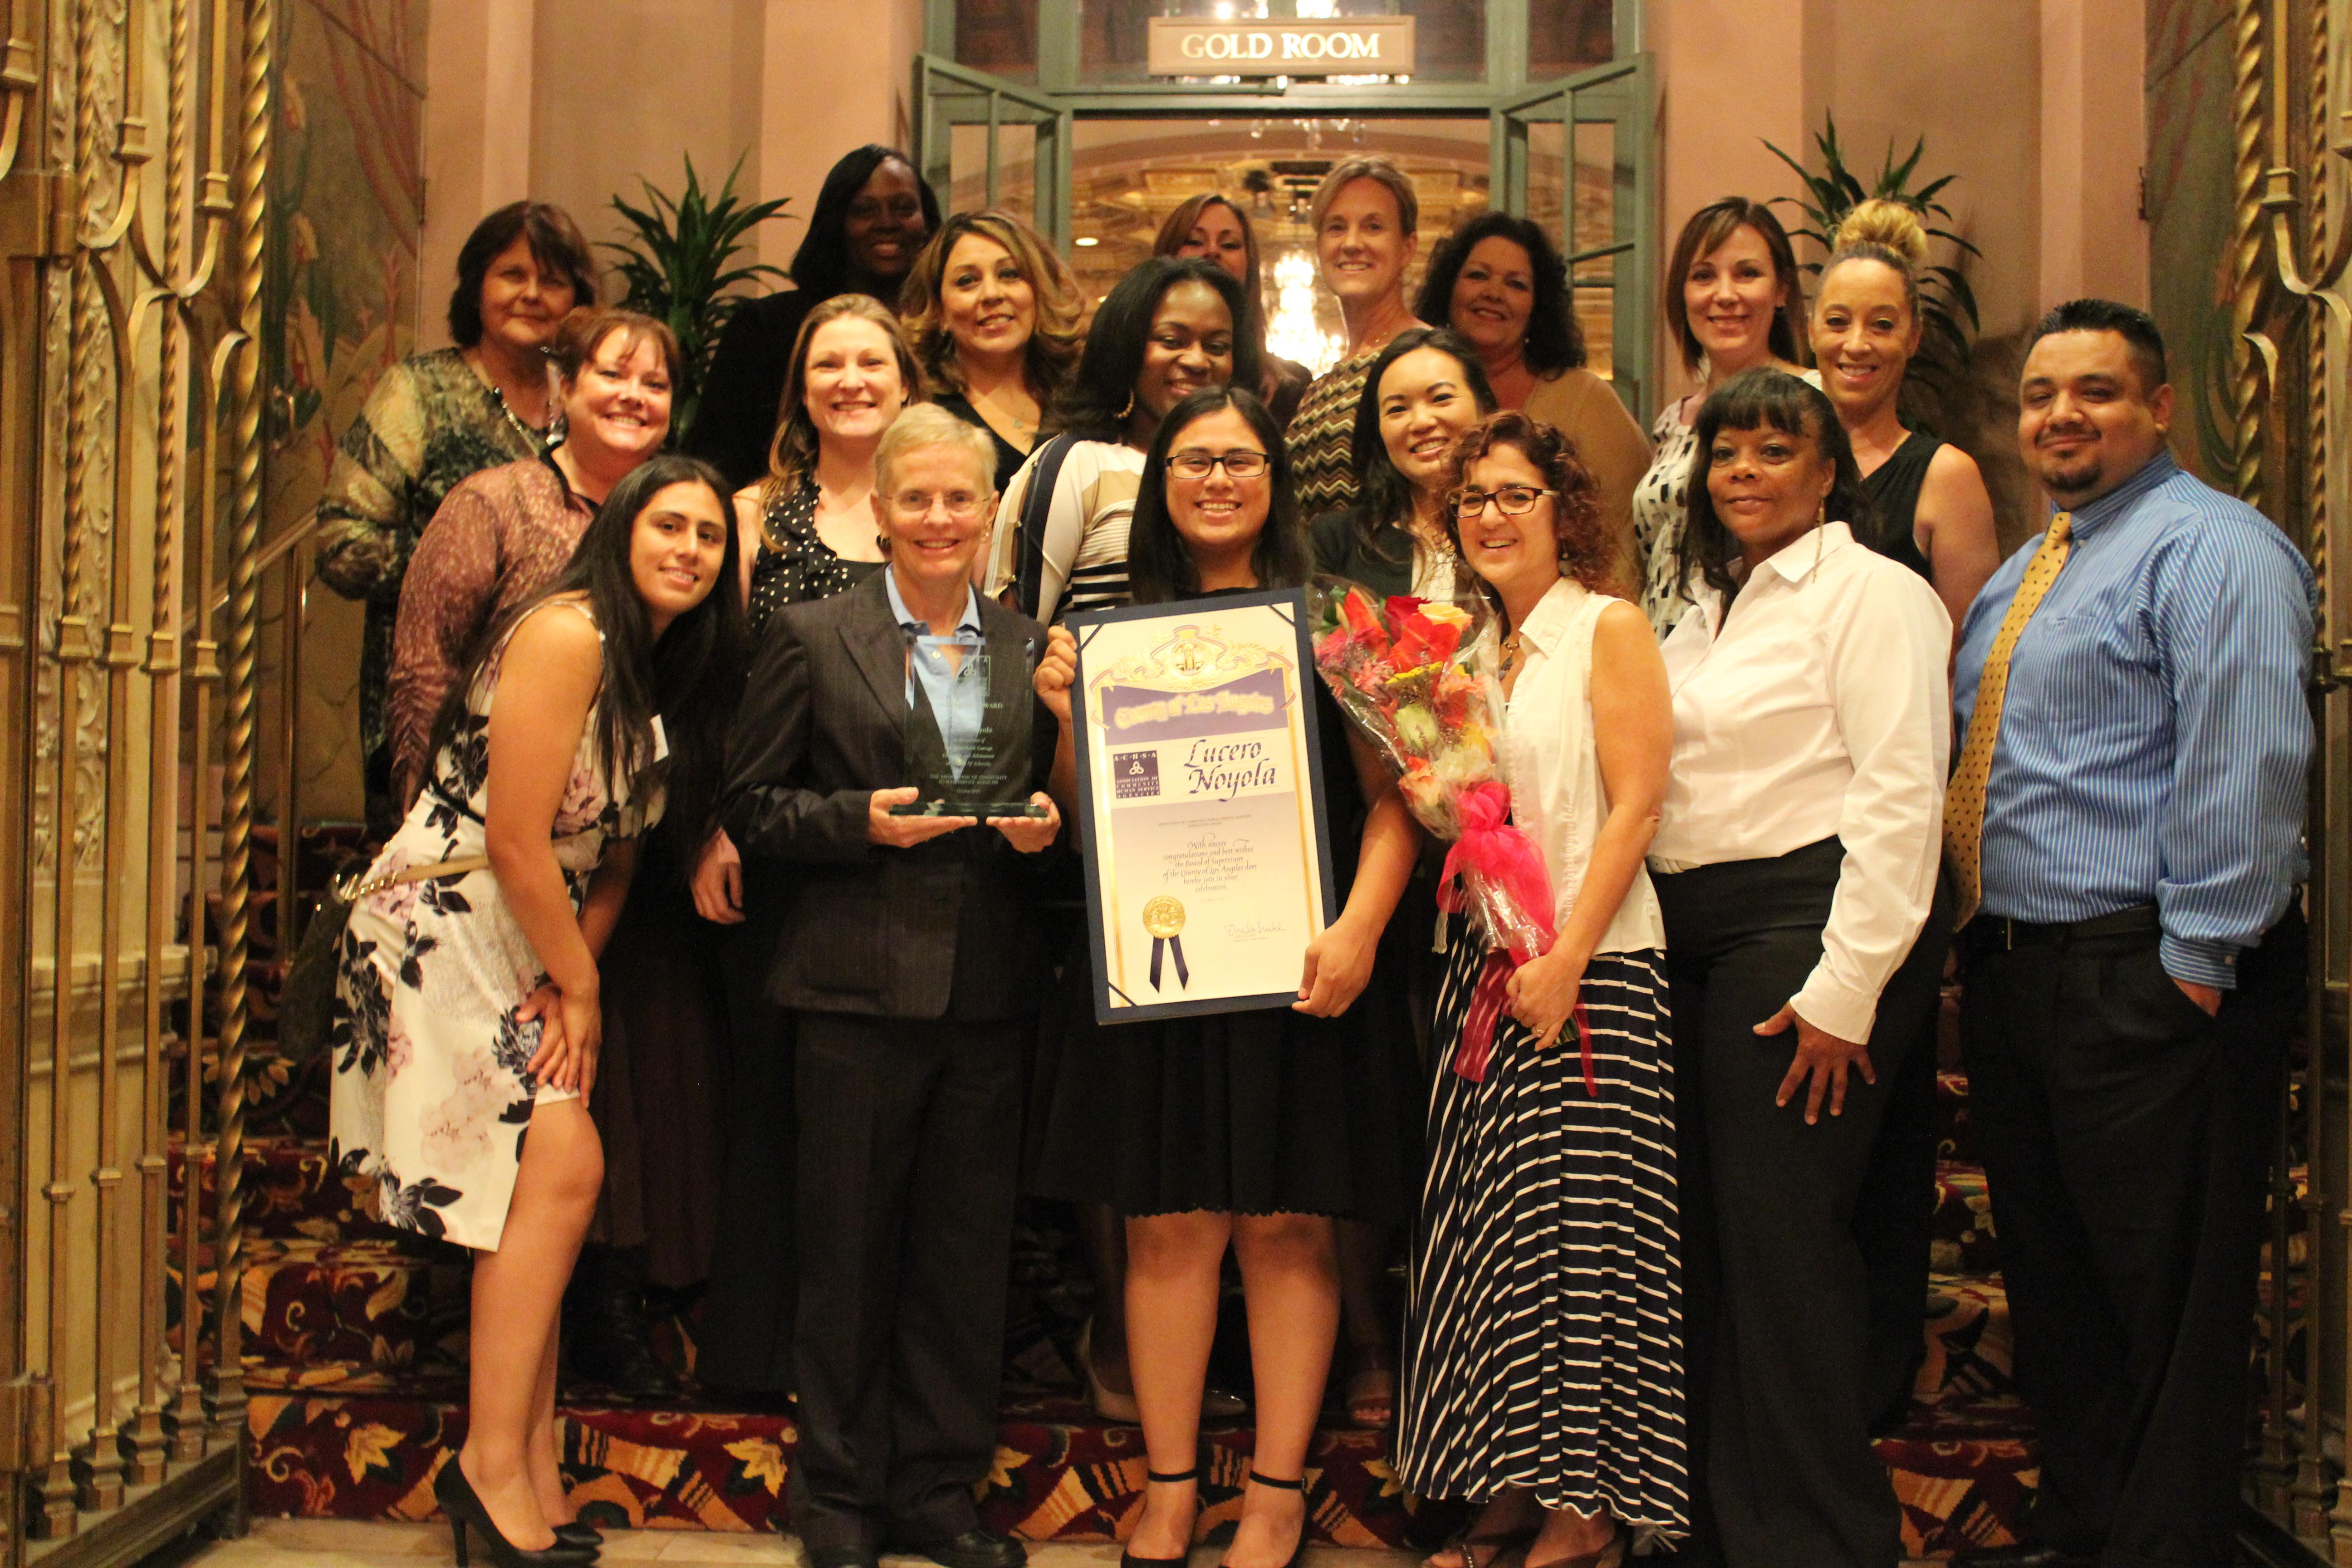 Team Crittenton at the 2015 Association of Community Human Service Agencies